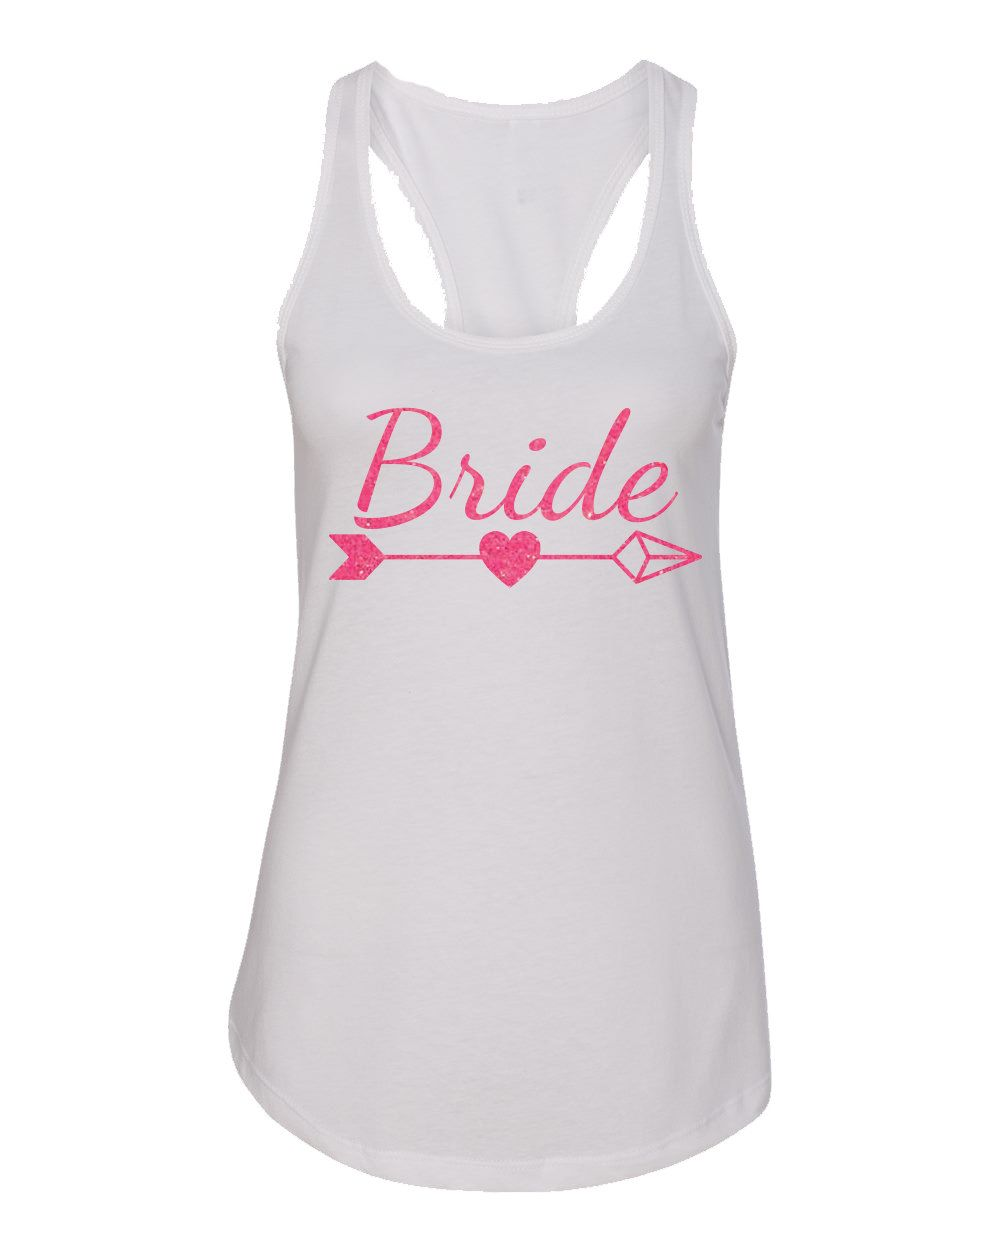 BRIDE with TRIBE Bachelorette Tank by GirlsLoveGlitter on Etsy